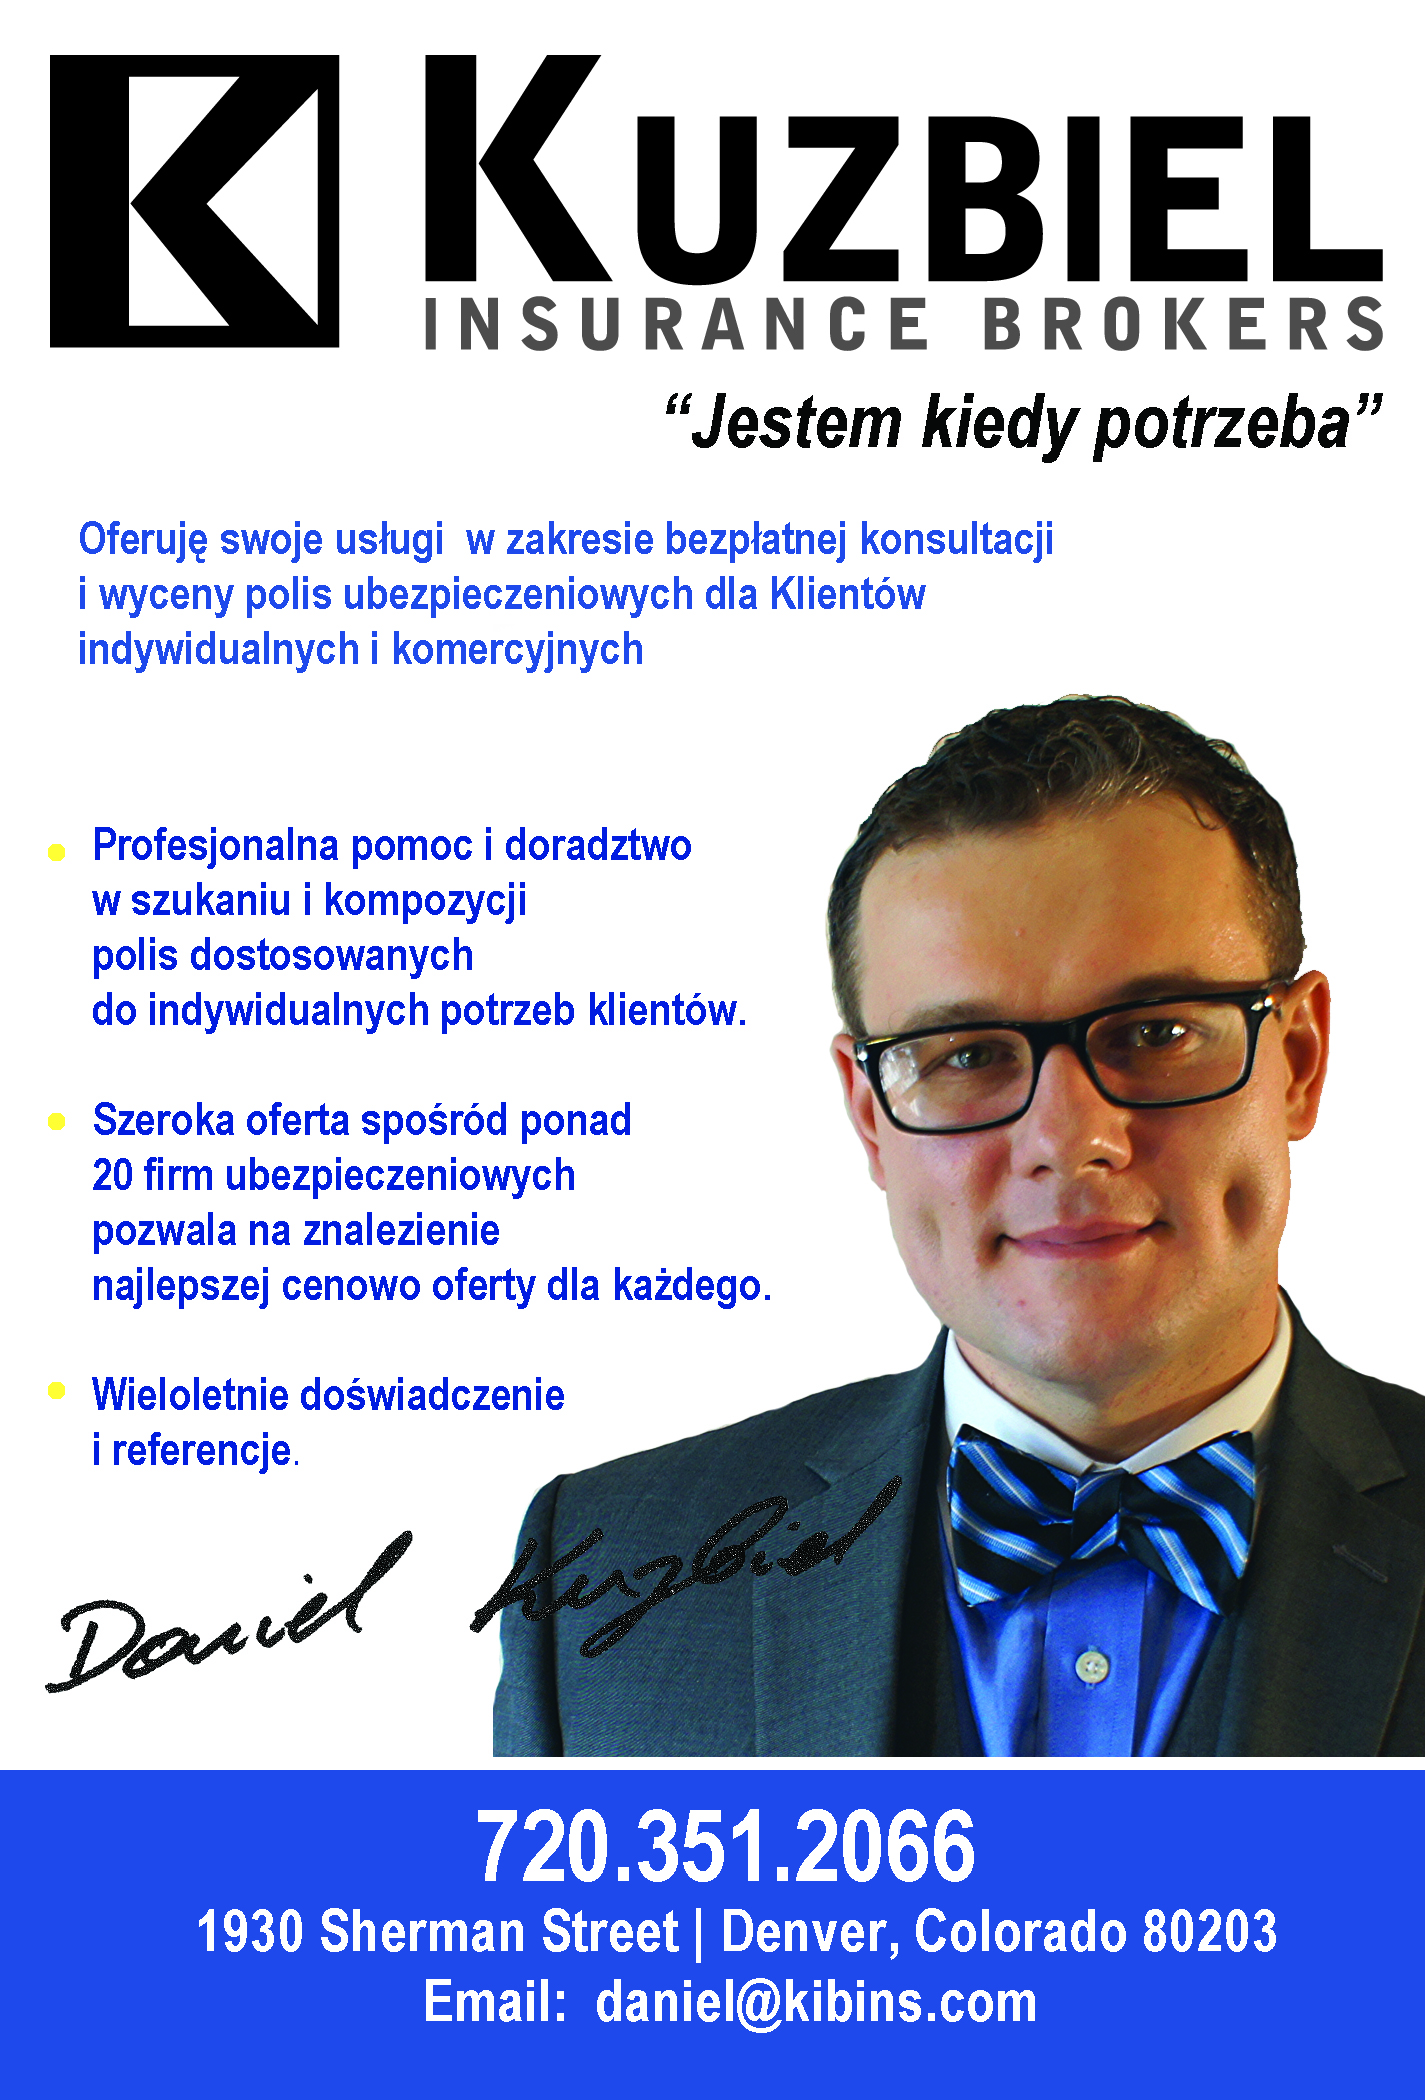 Daniel Kuzbiel.jpg